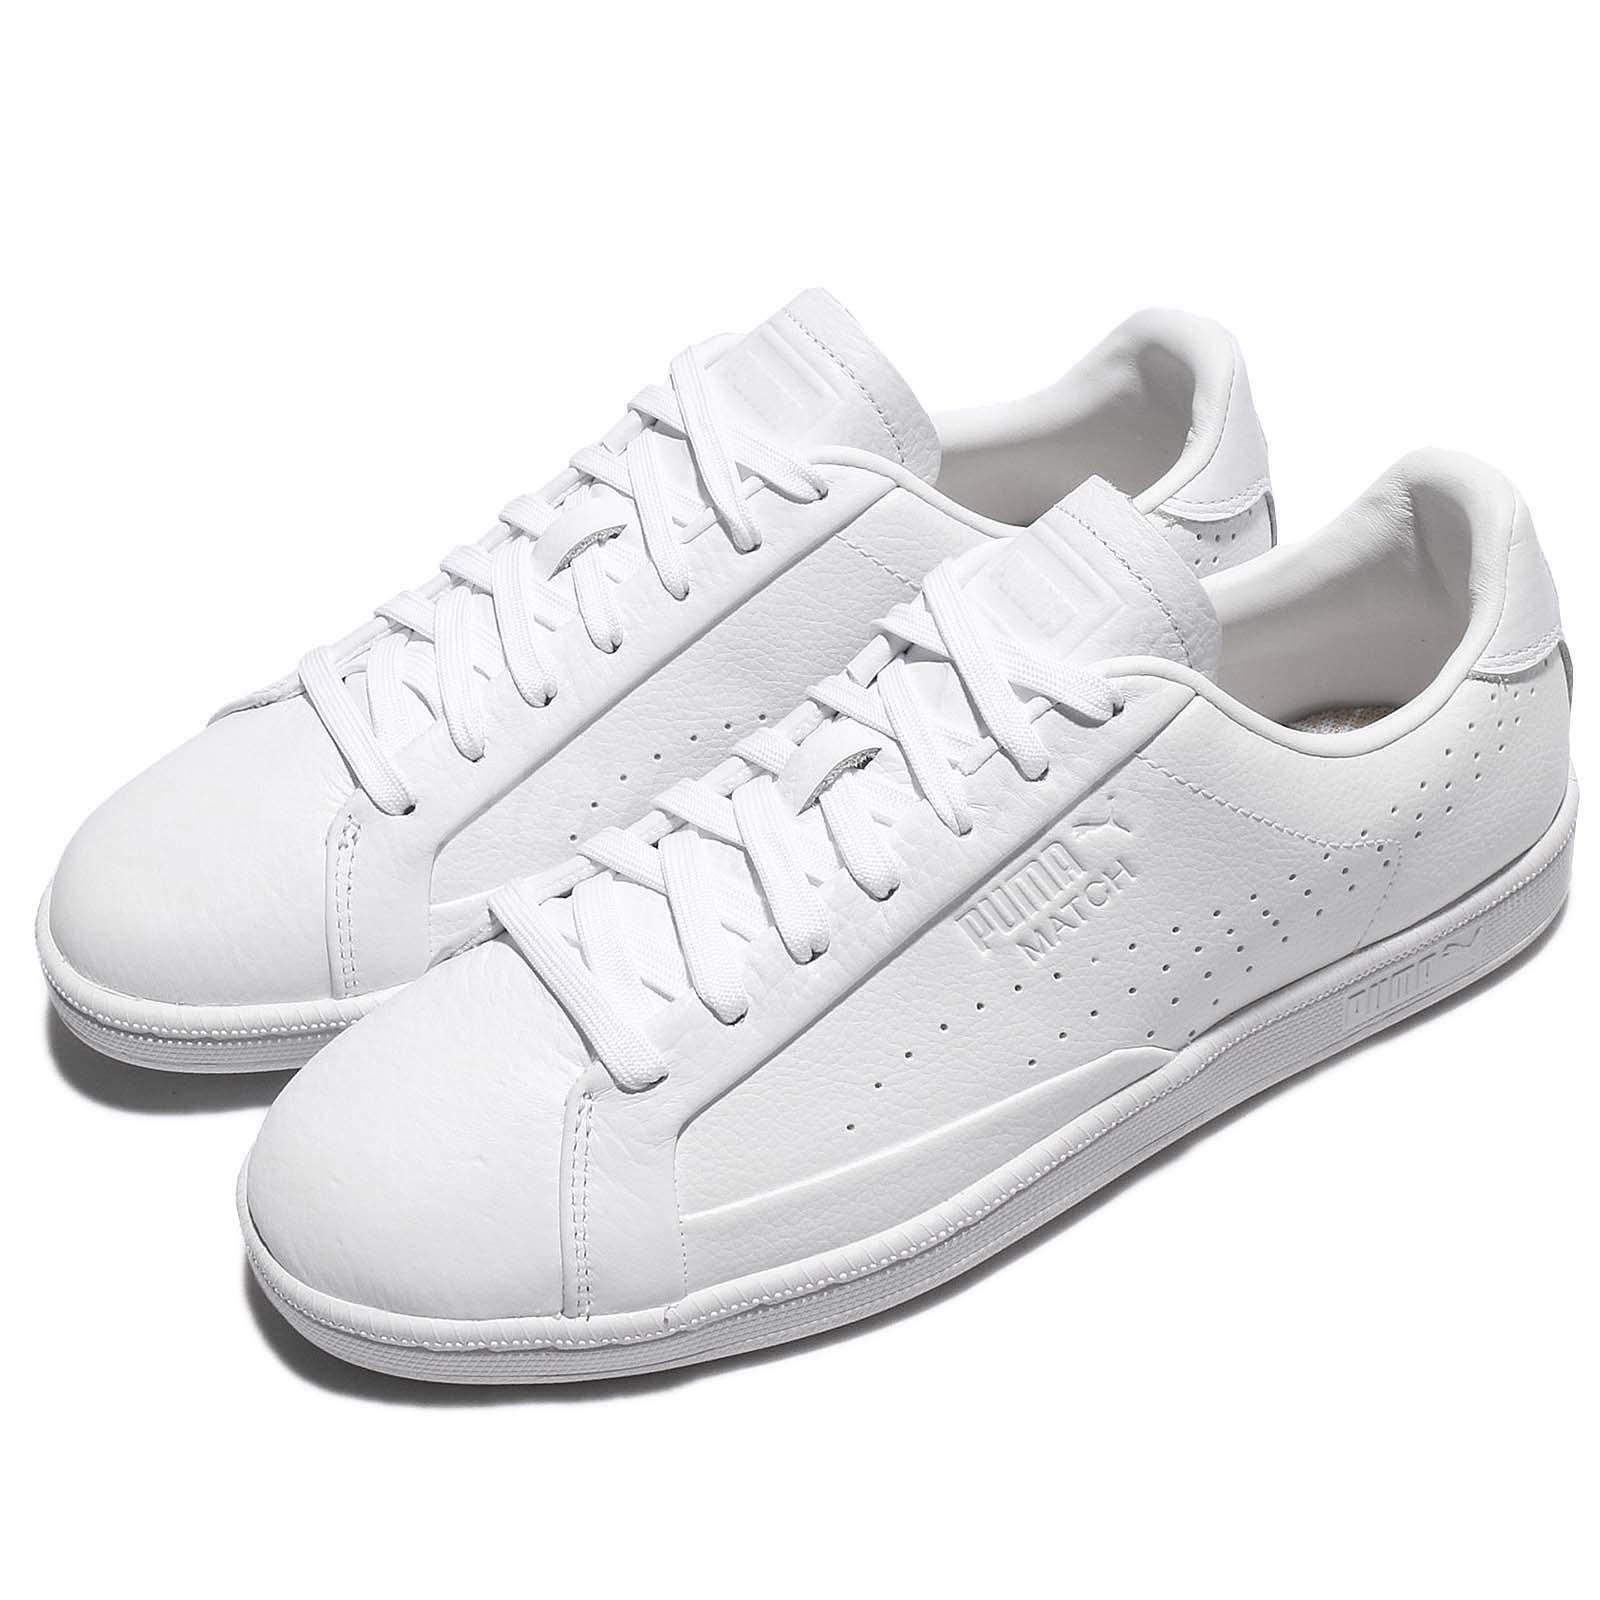 Puma Match 74 tumbled Leather triple Blanco Hombre Zapatos zapatos zapatillas formadores 363884-01 baratos zapatos Zapatos de mujer zapatos de mujer 9fc354